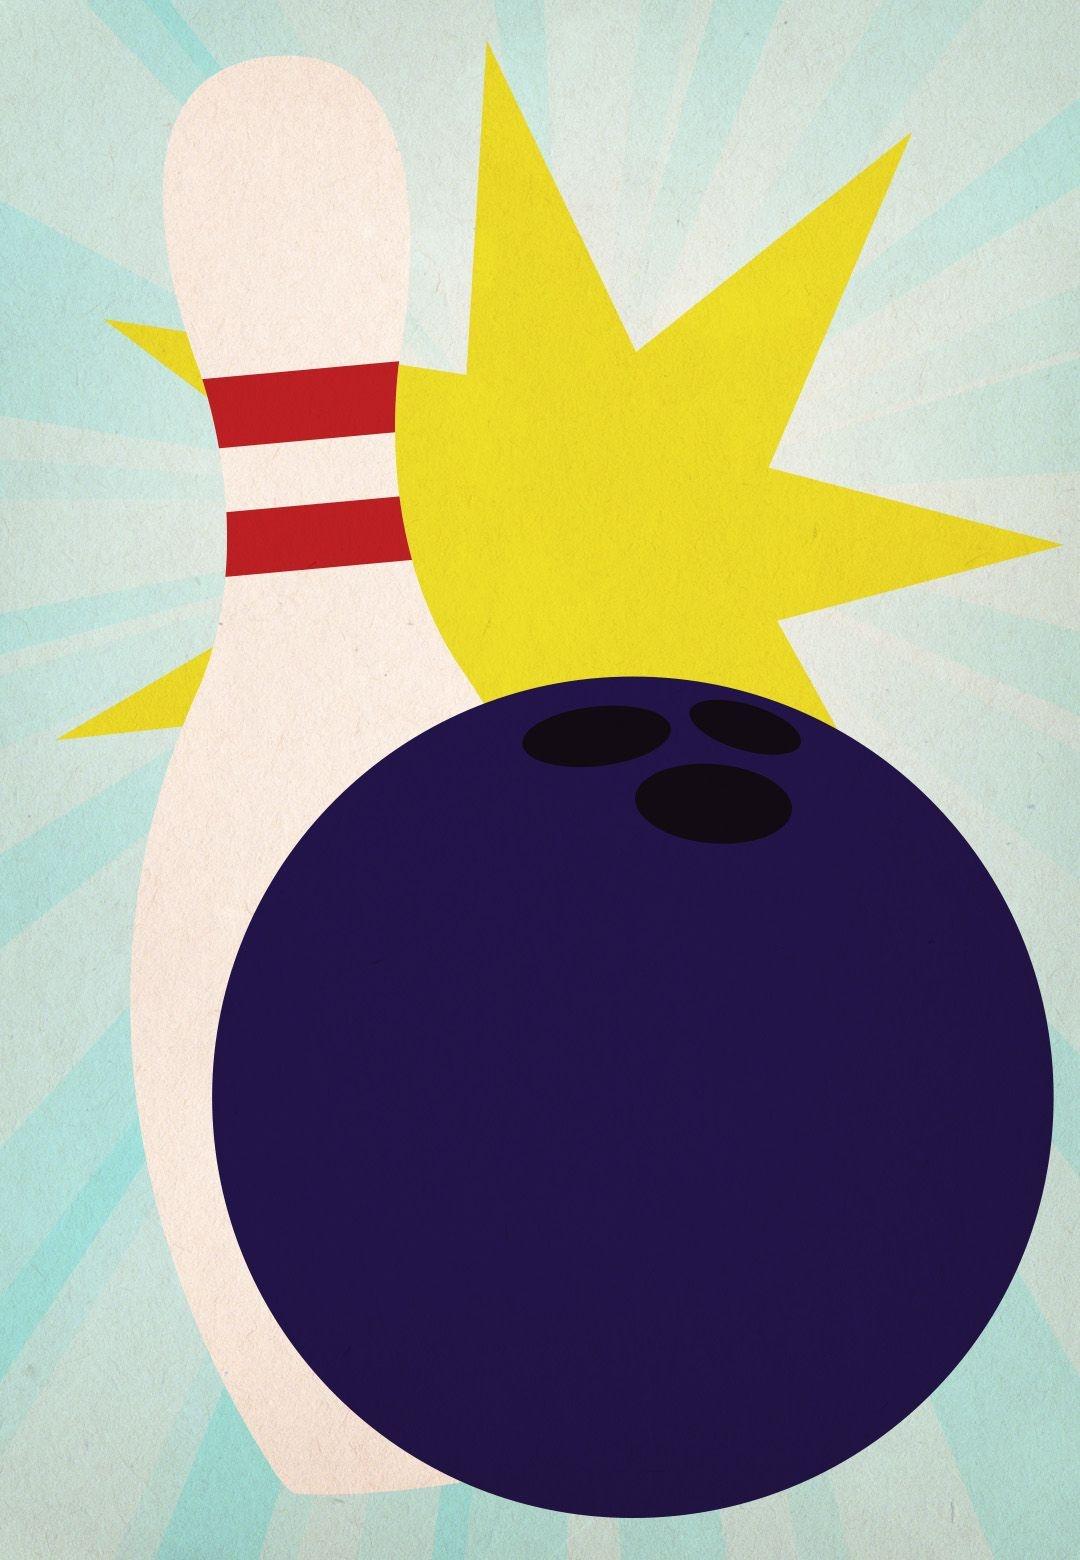 Bowling Birthday Party - Free Printable Birthday Invitation Template - Free Printable Bowling Ball Template